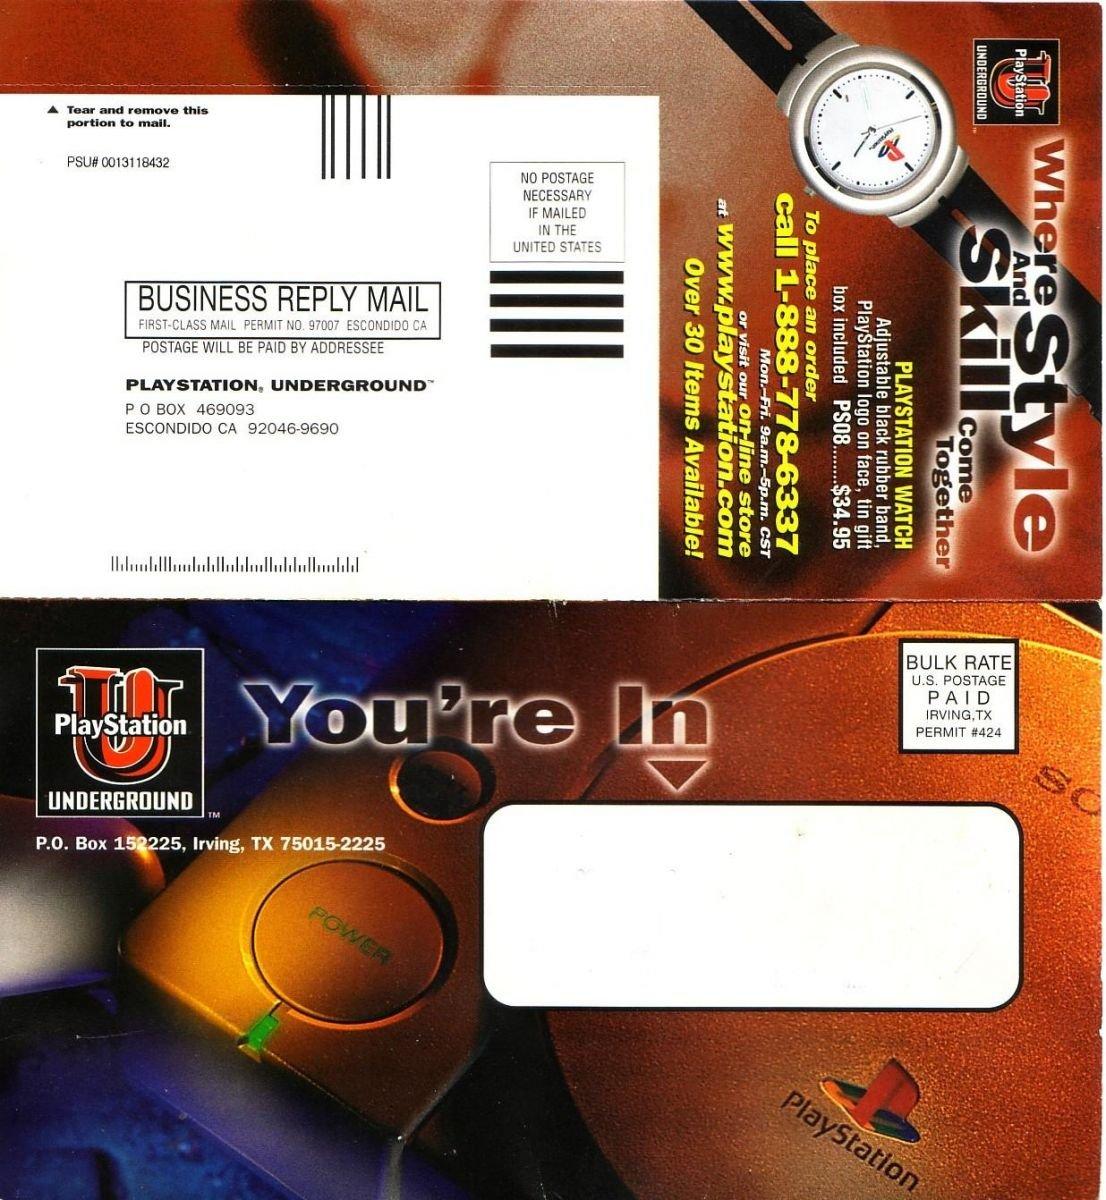 psu mailing 2.jpg